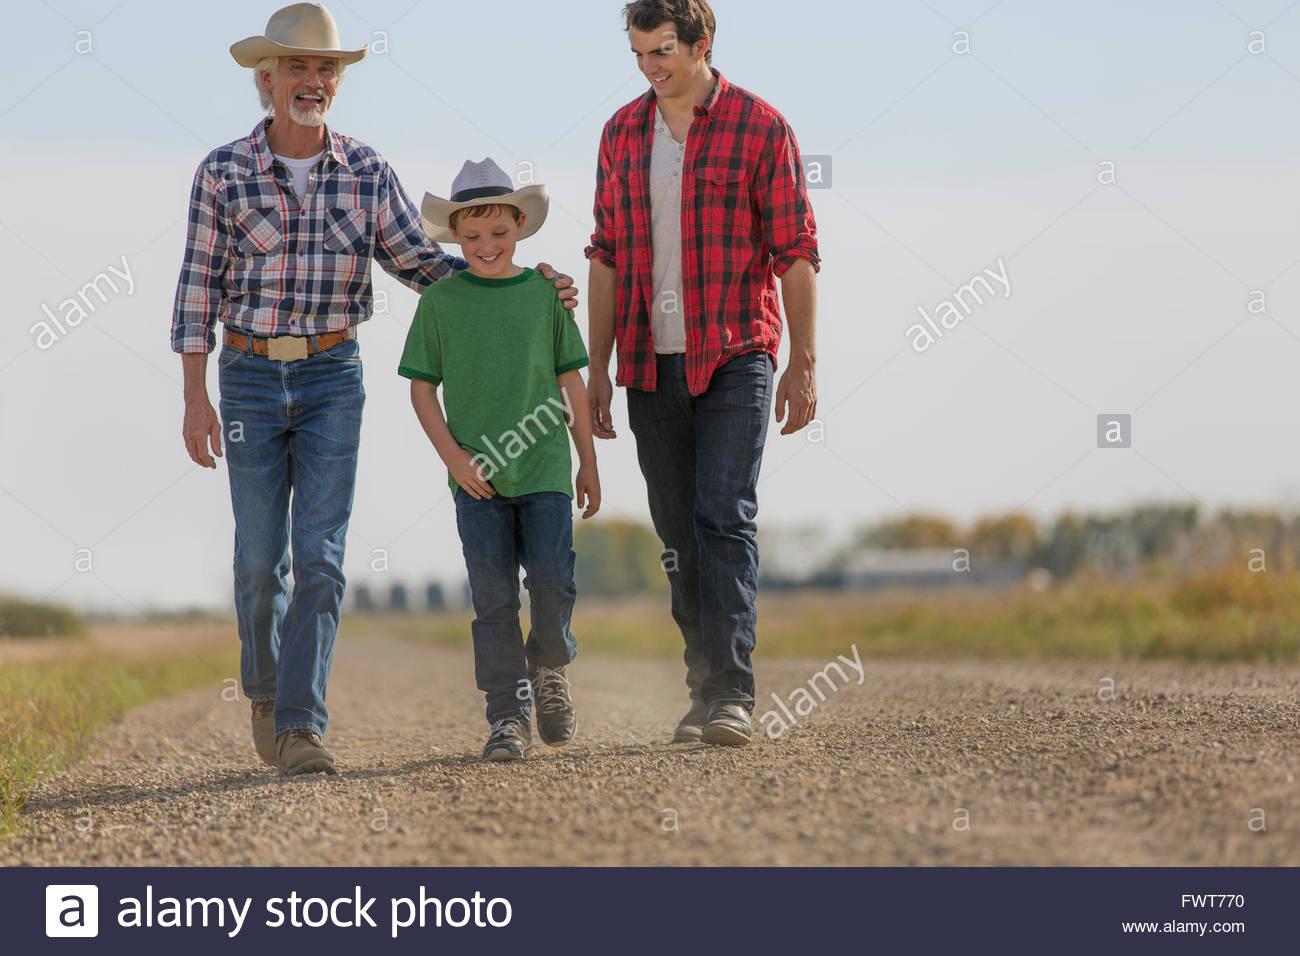 Three generations of males walking down rural road. - Stock Image